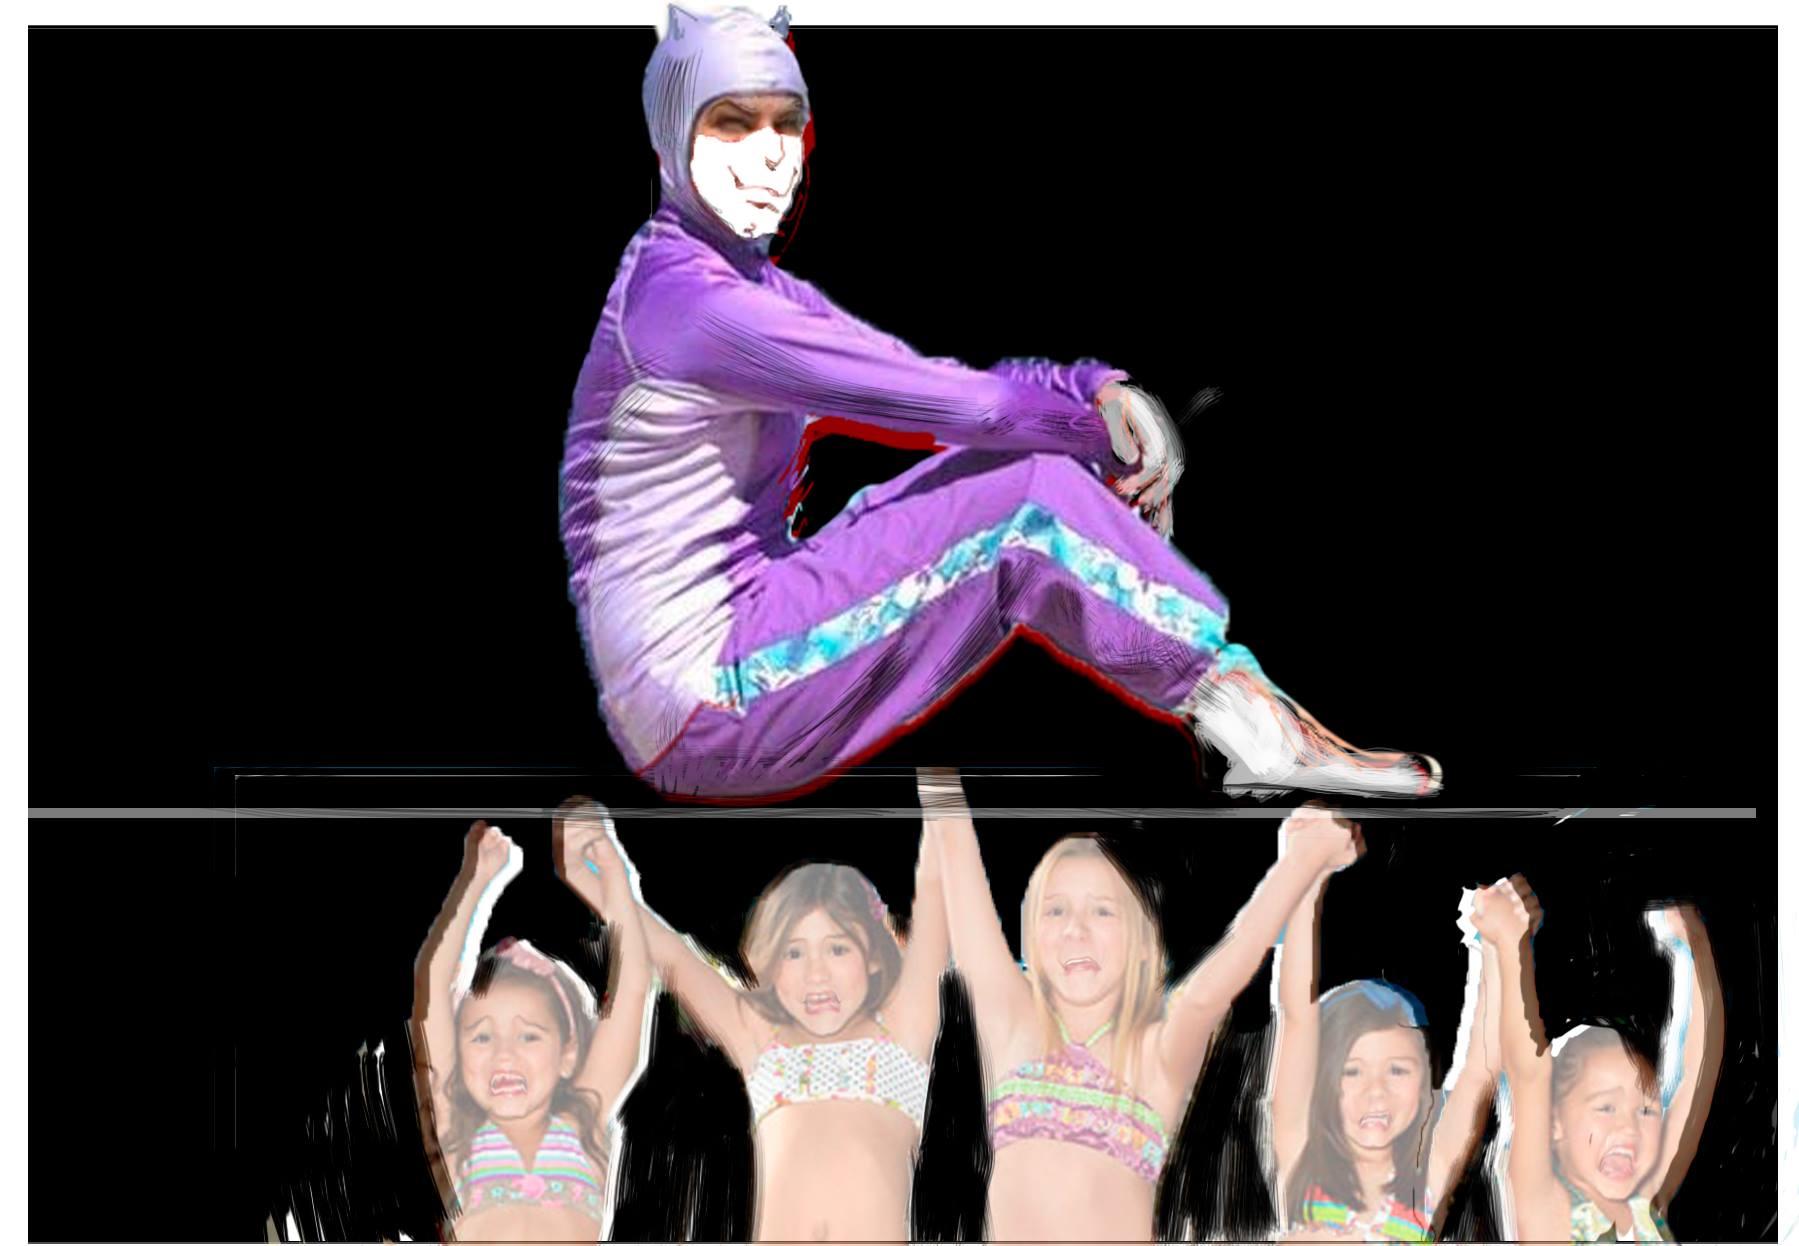 Burkini eller bikini skolens svømmeundervisning? Ill. Kristin B. Bruun